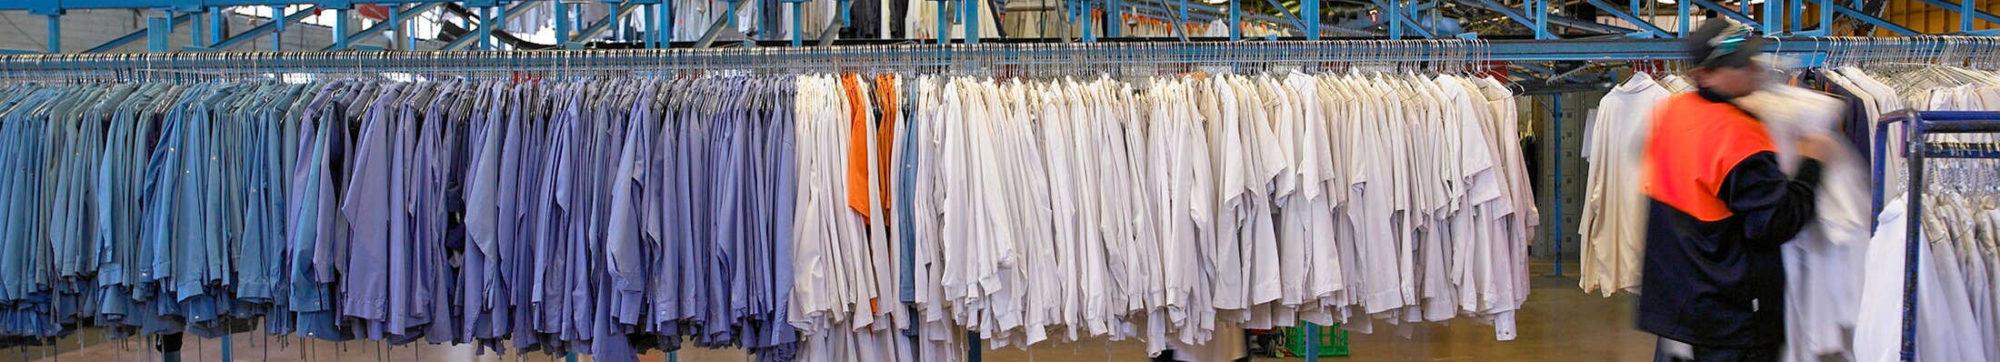 IntelTagRFID About us Laundry